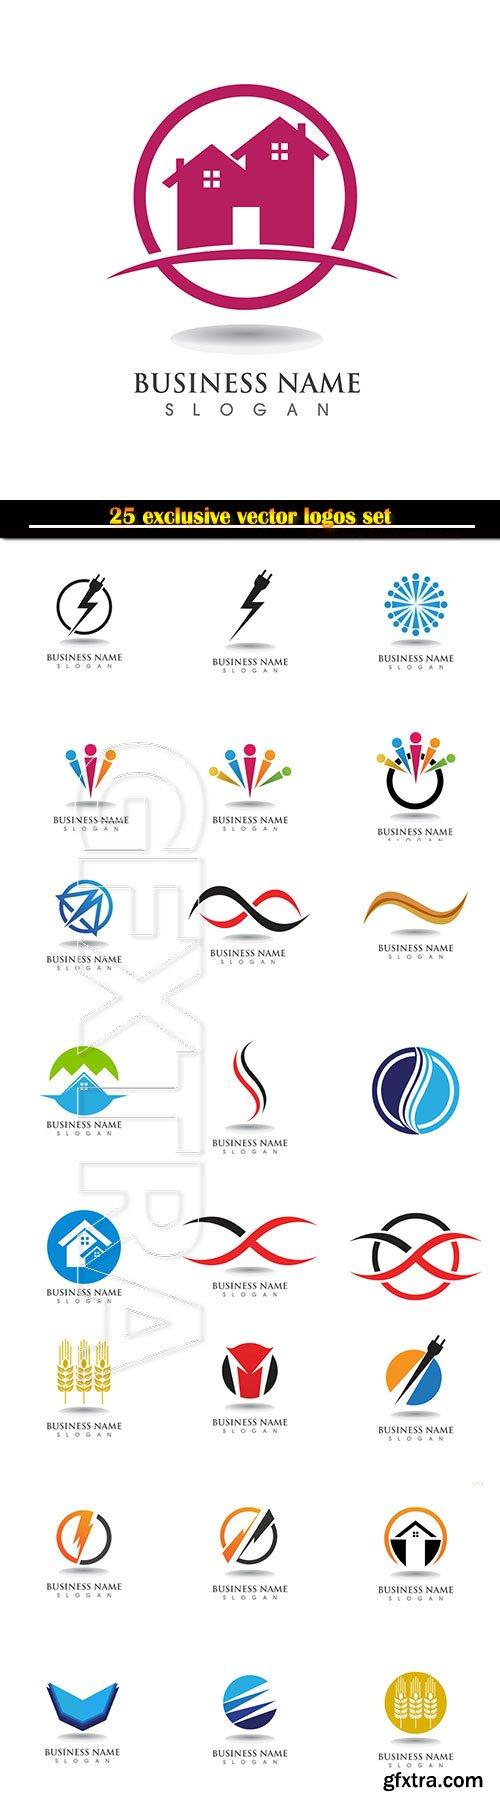 Logo business vector illustration template # 127